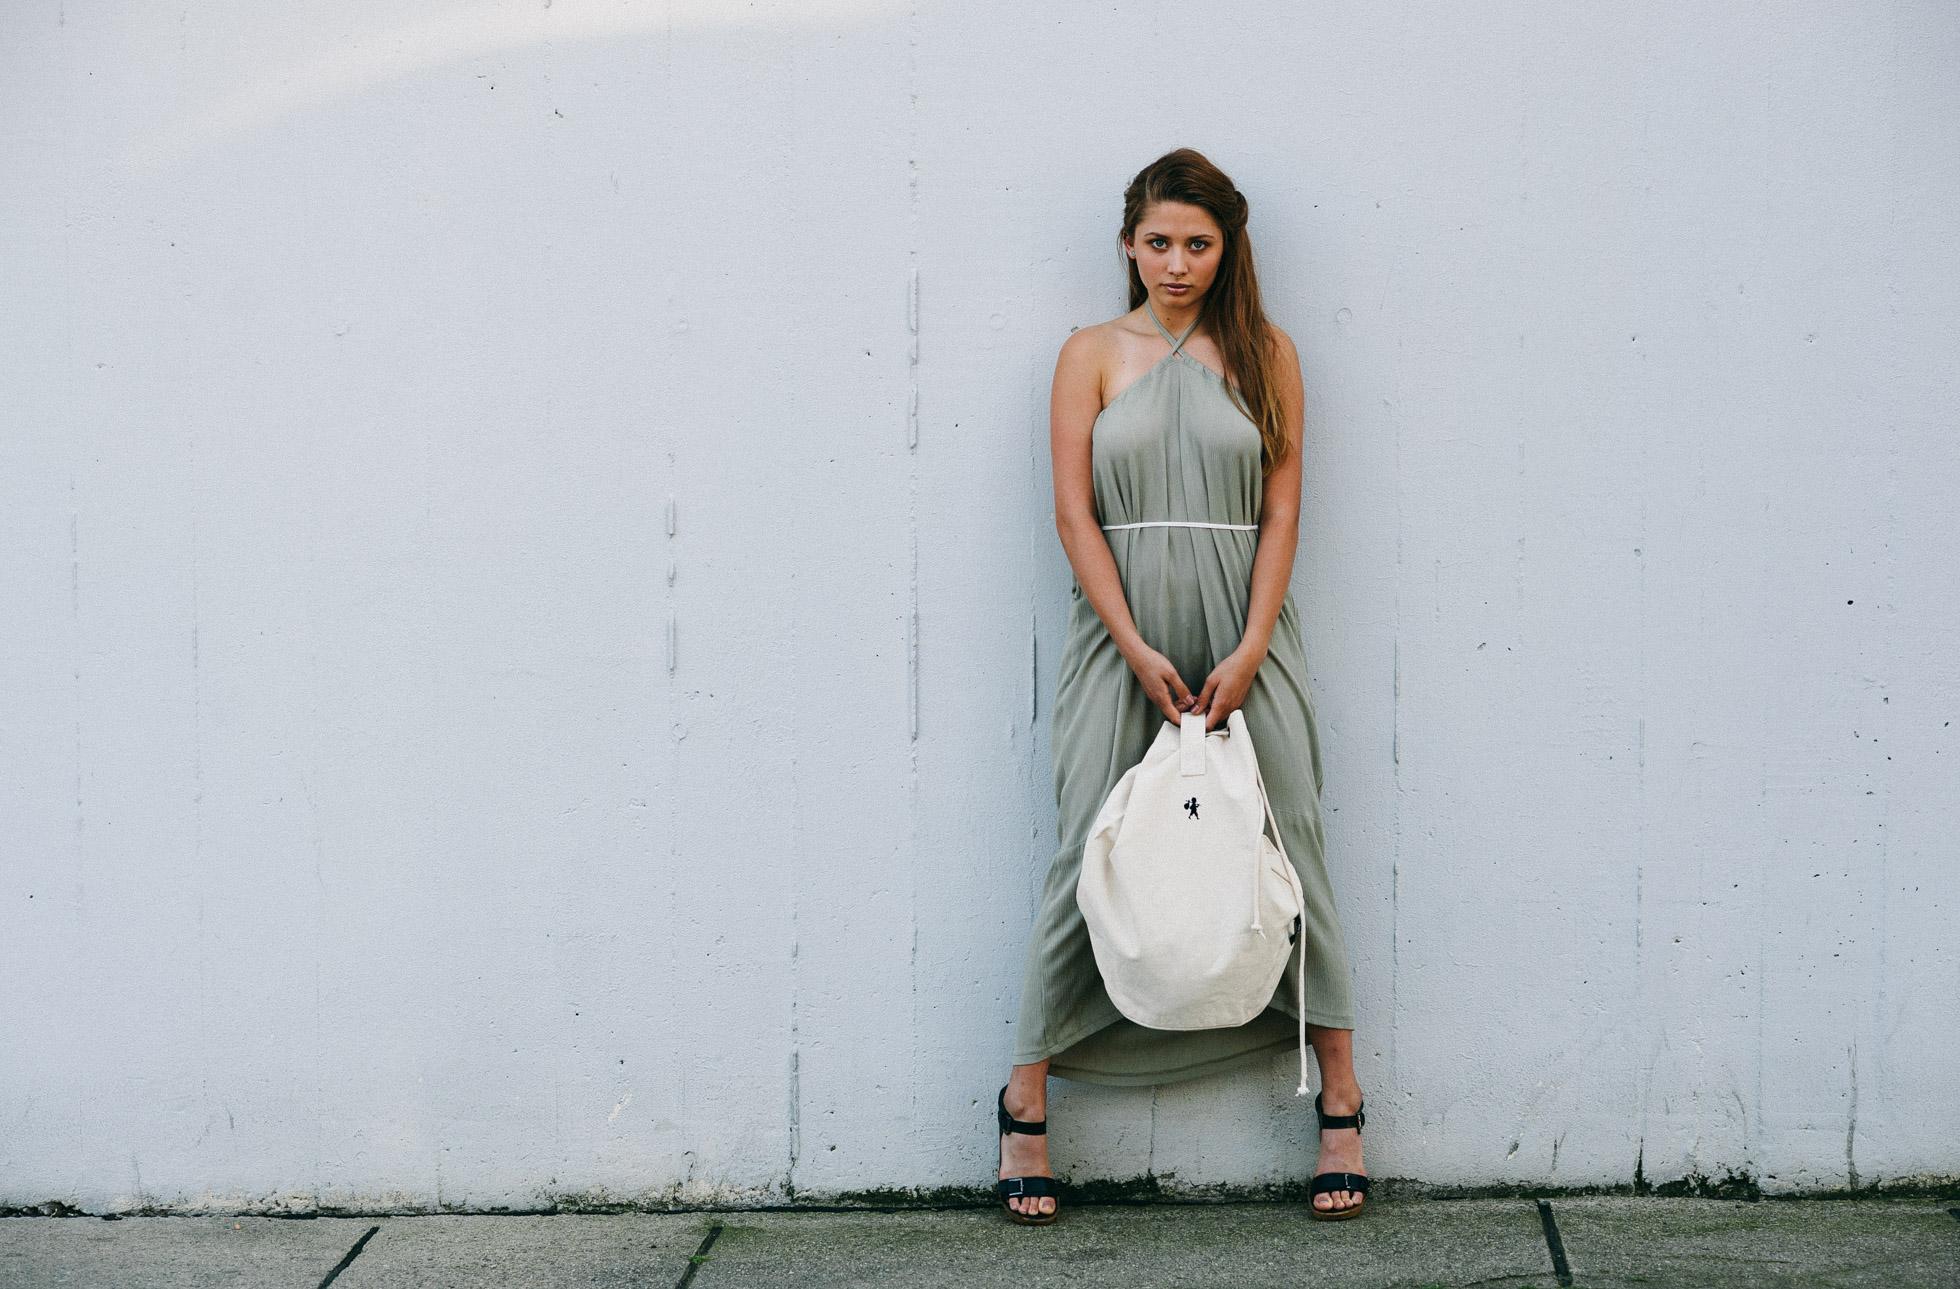 Model: Anna P. / Fresh Face